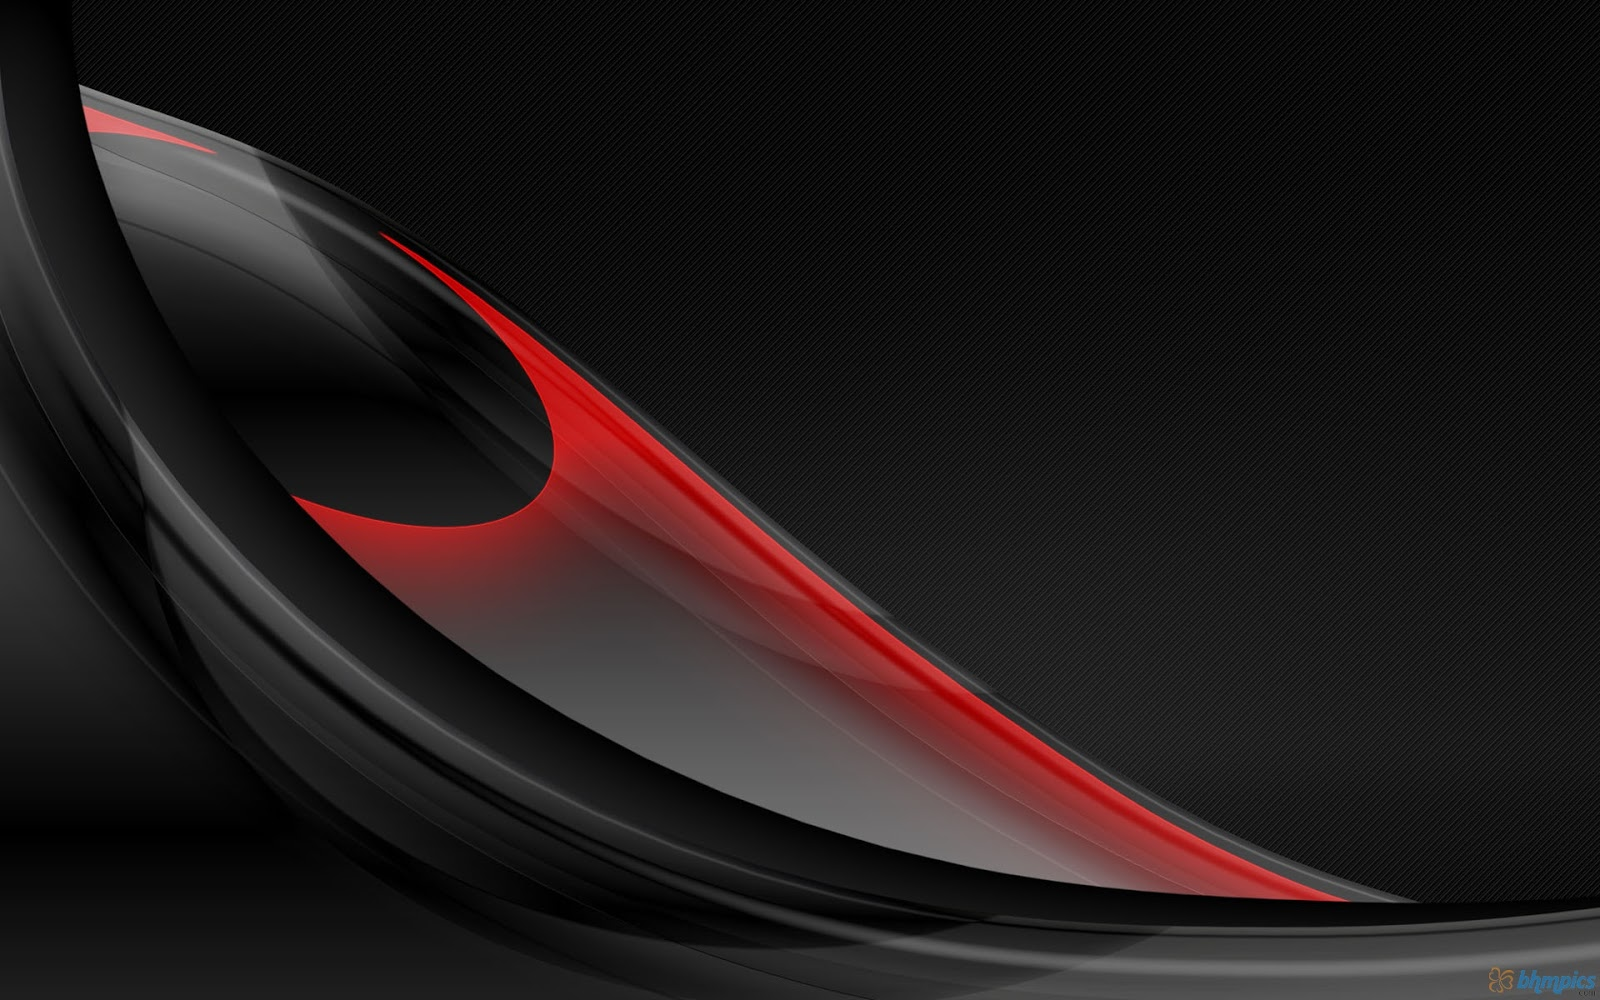 http://1.bp.blogspot.com/-2OC8bg4lXVI/UIAFtzCv3qI/AAAAAAAAGV8/Lt-7bscEekI/s1600/abstract_black_red-1920x1200.jpg